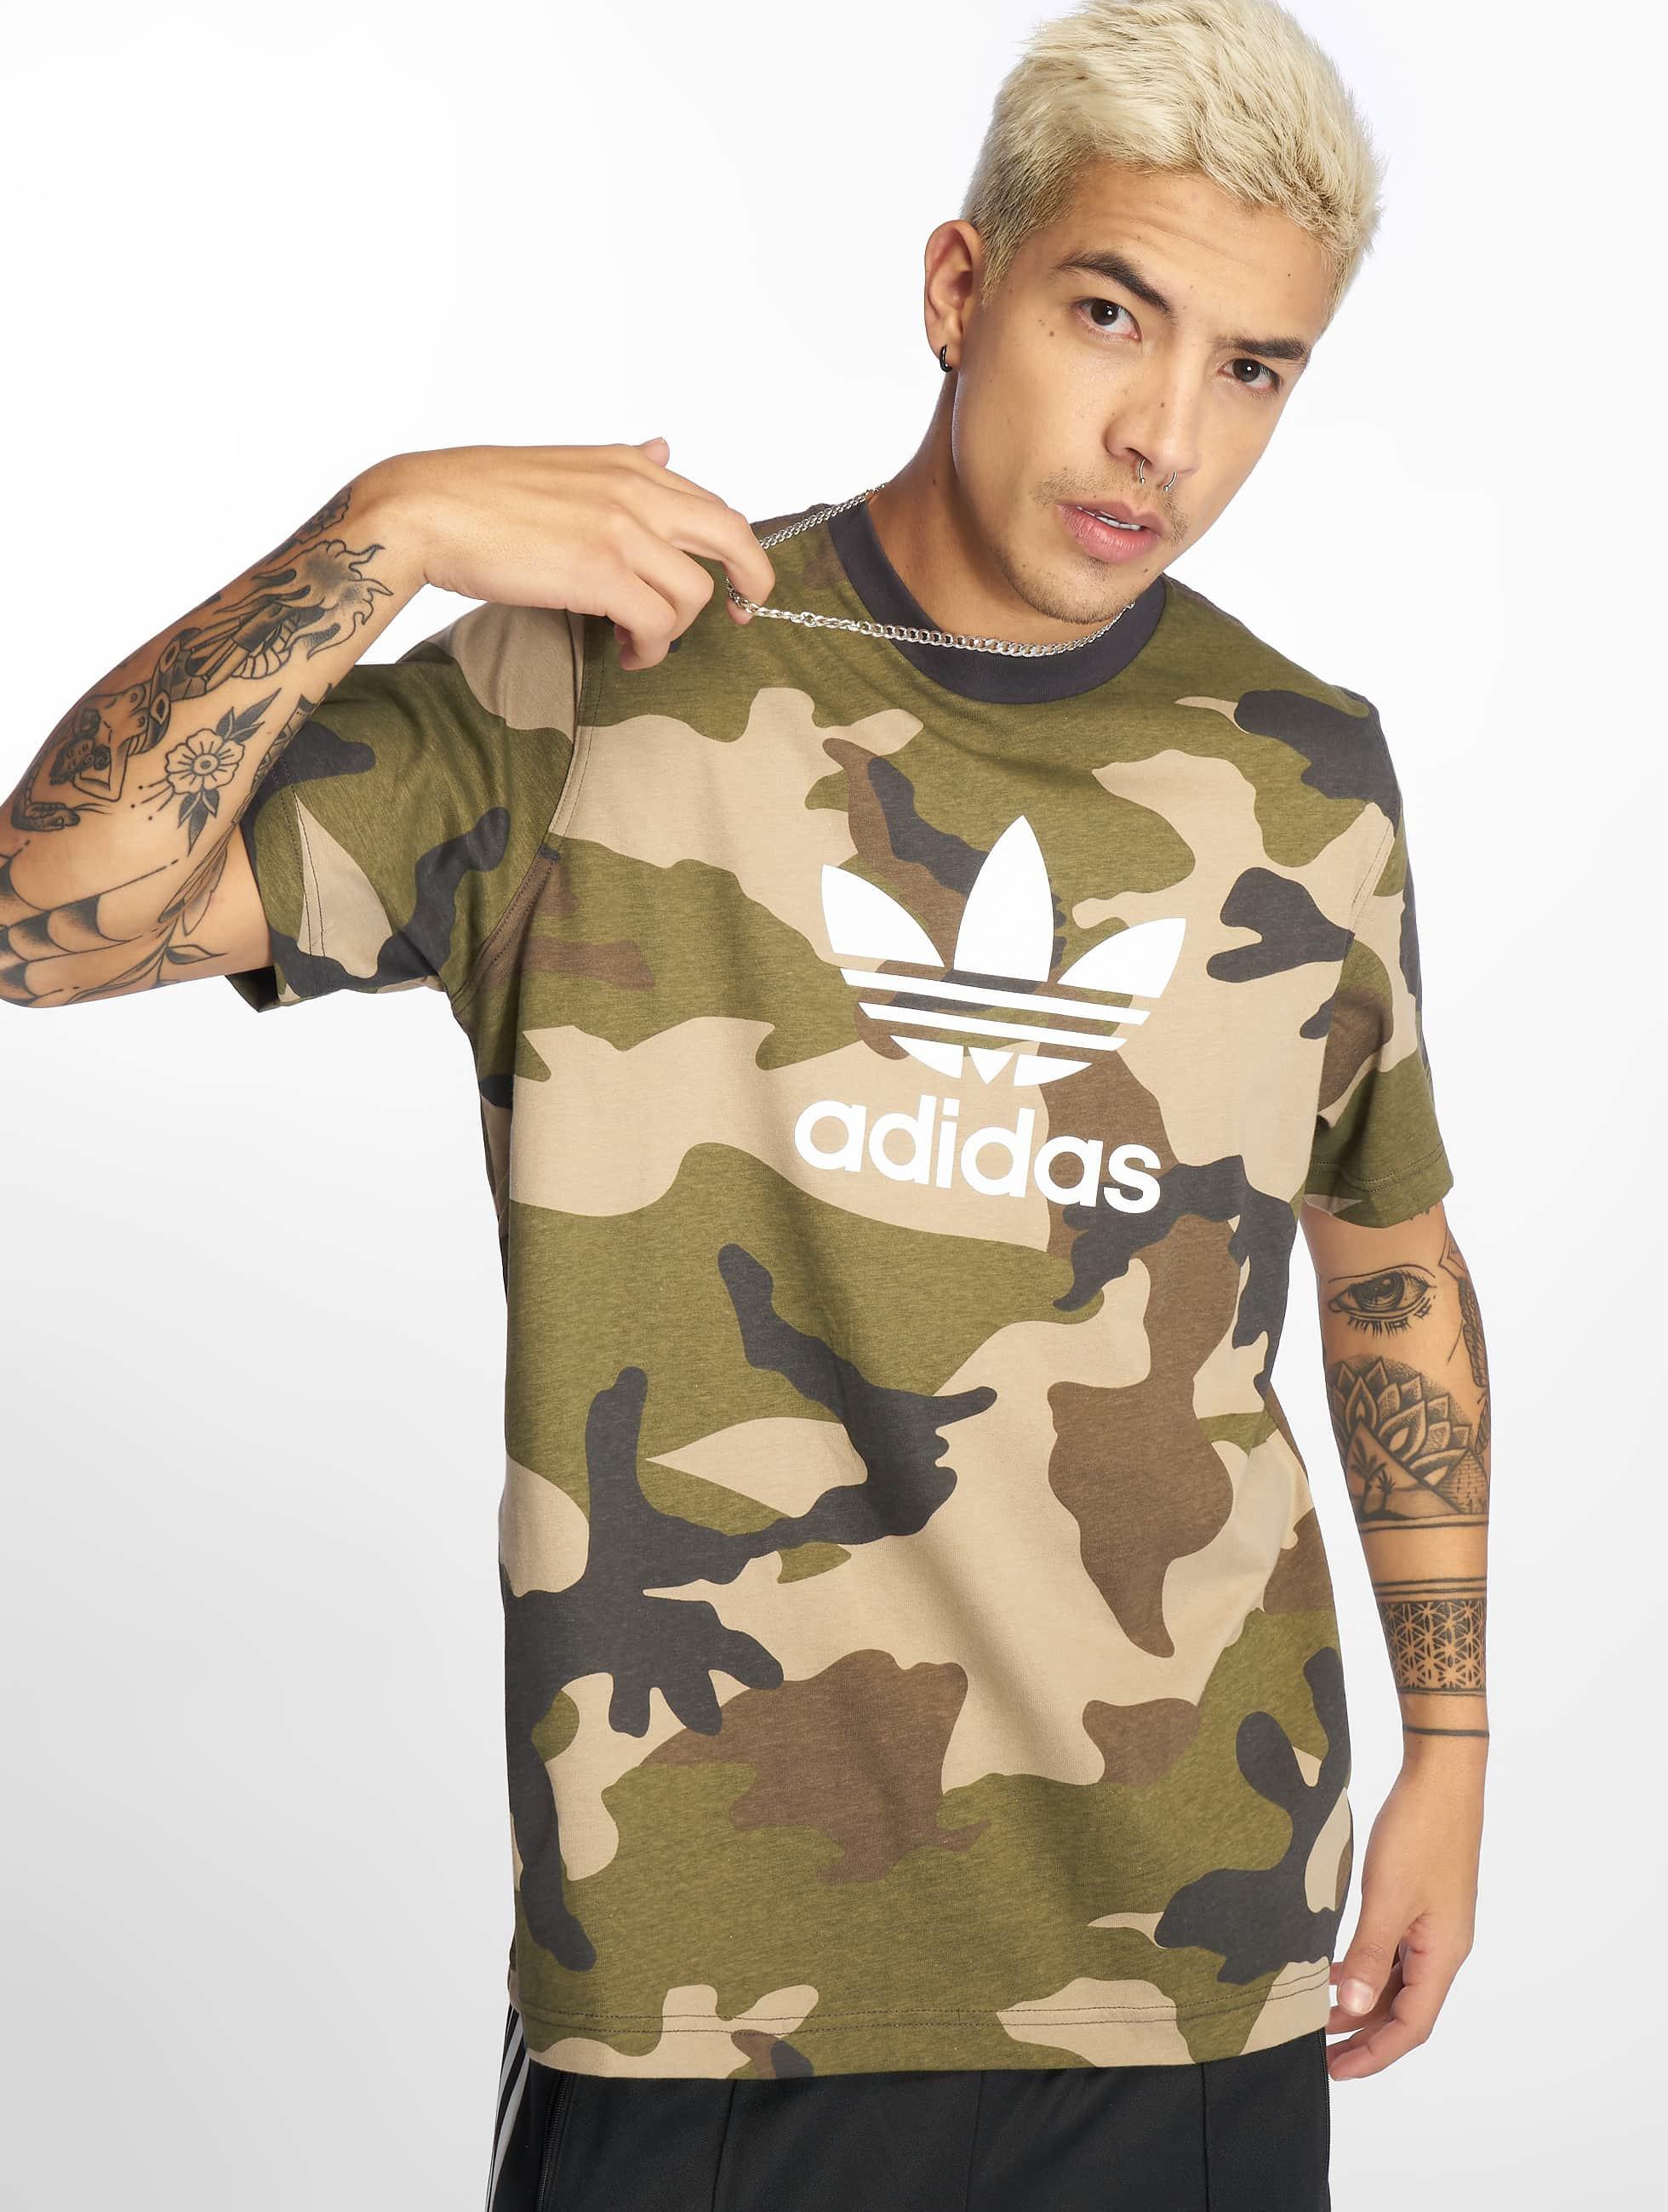 90ccfd9c468 adidas originals bovenstuk / t-shirt Camo in camouflage 598729